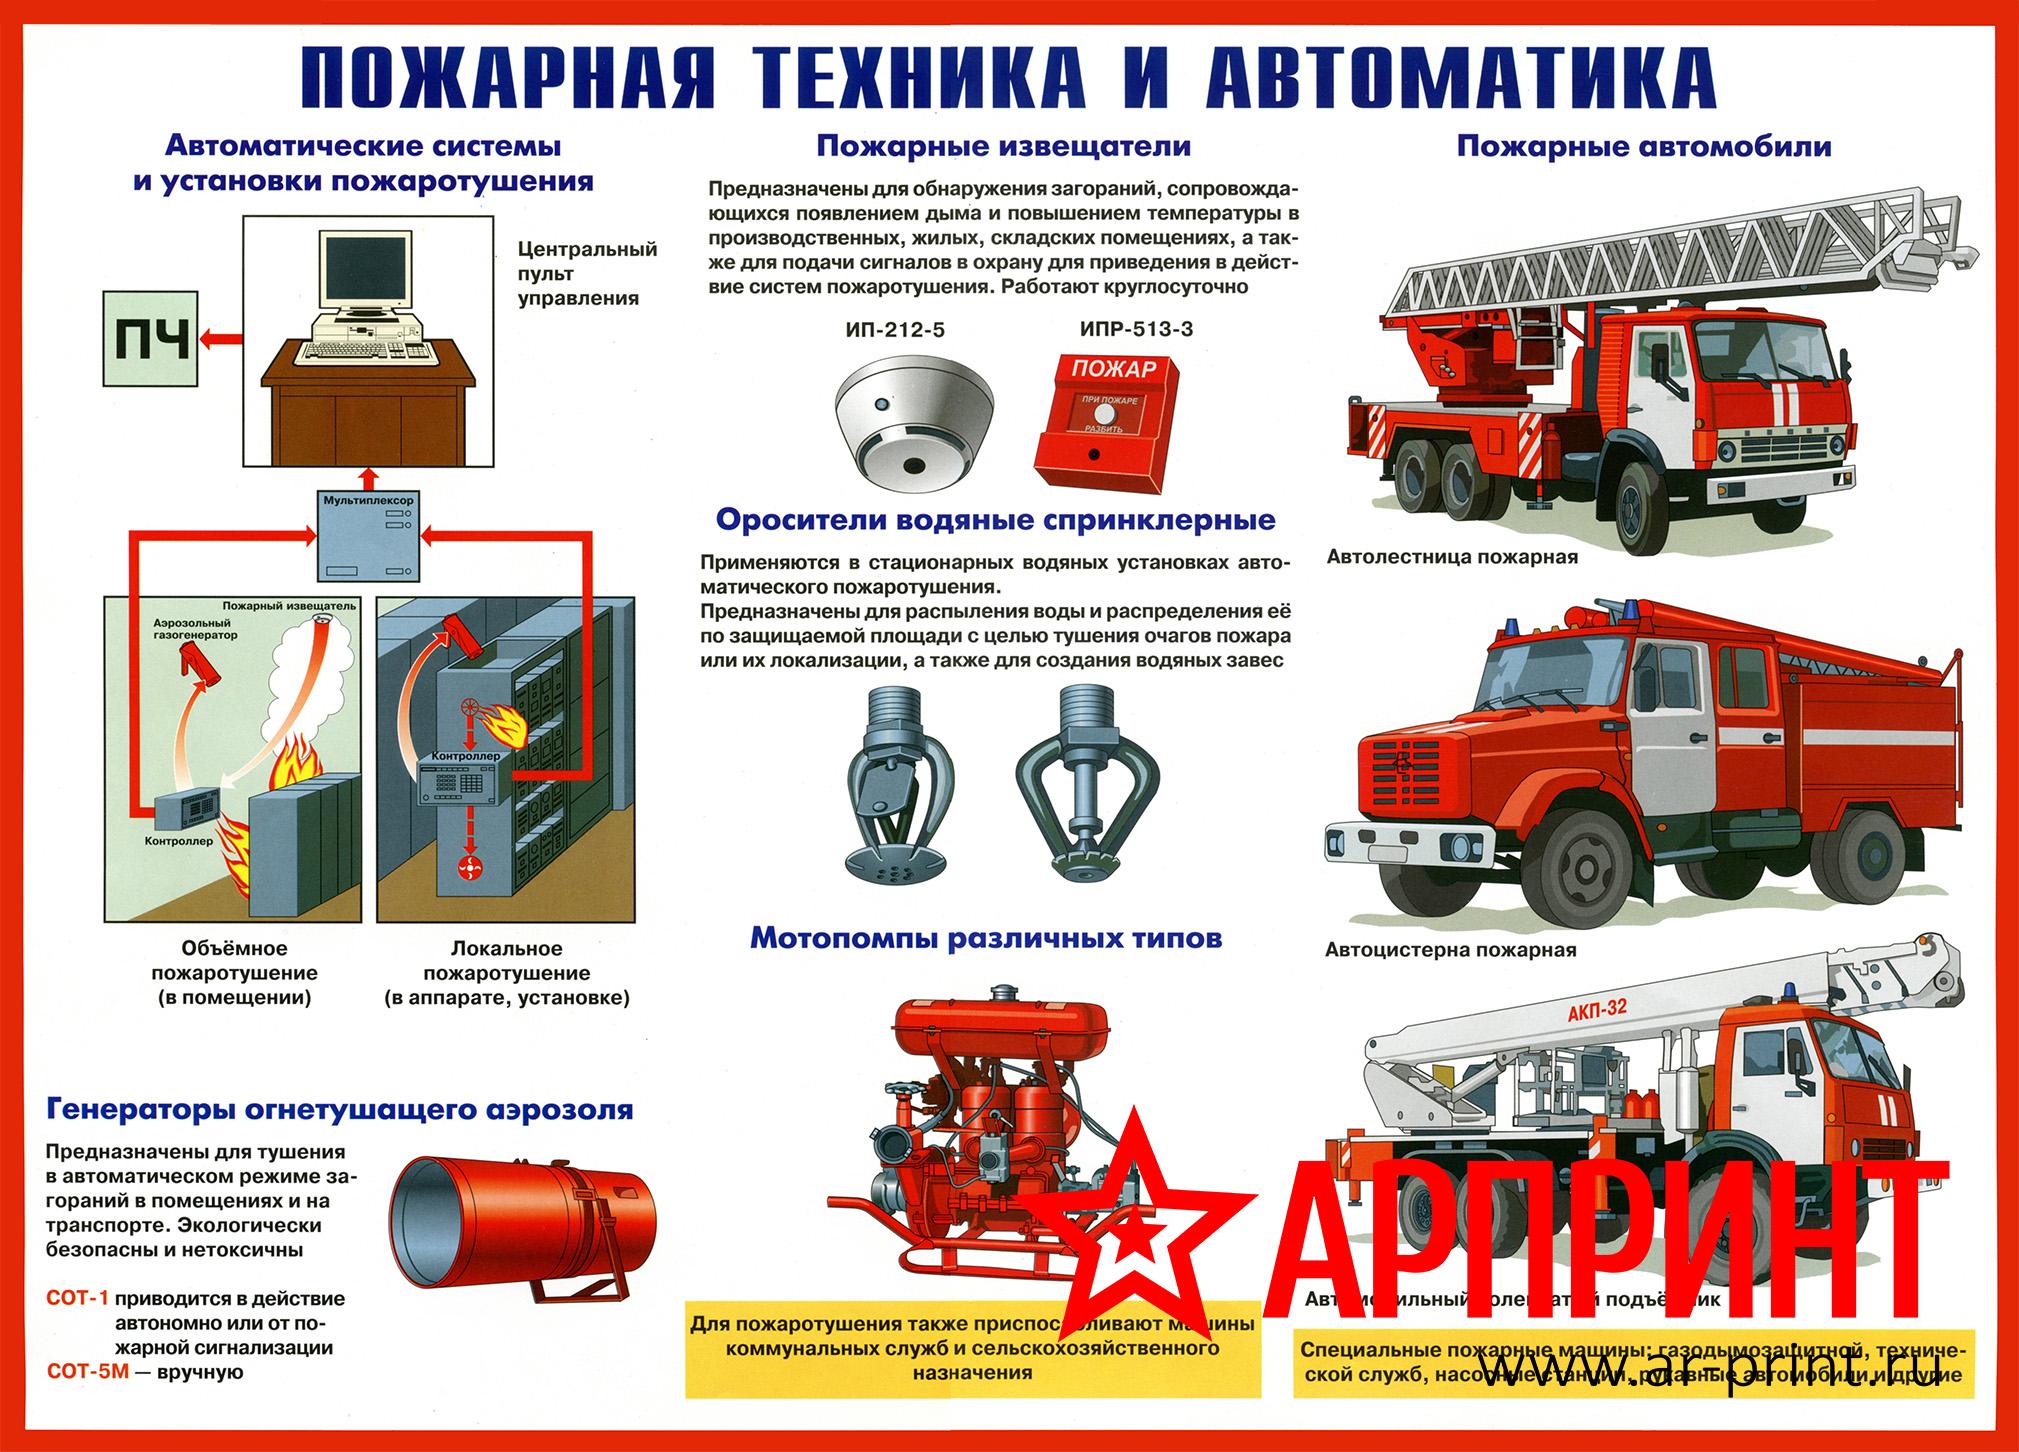 Пожарная техника и автоматика